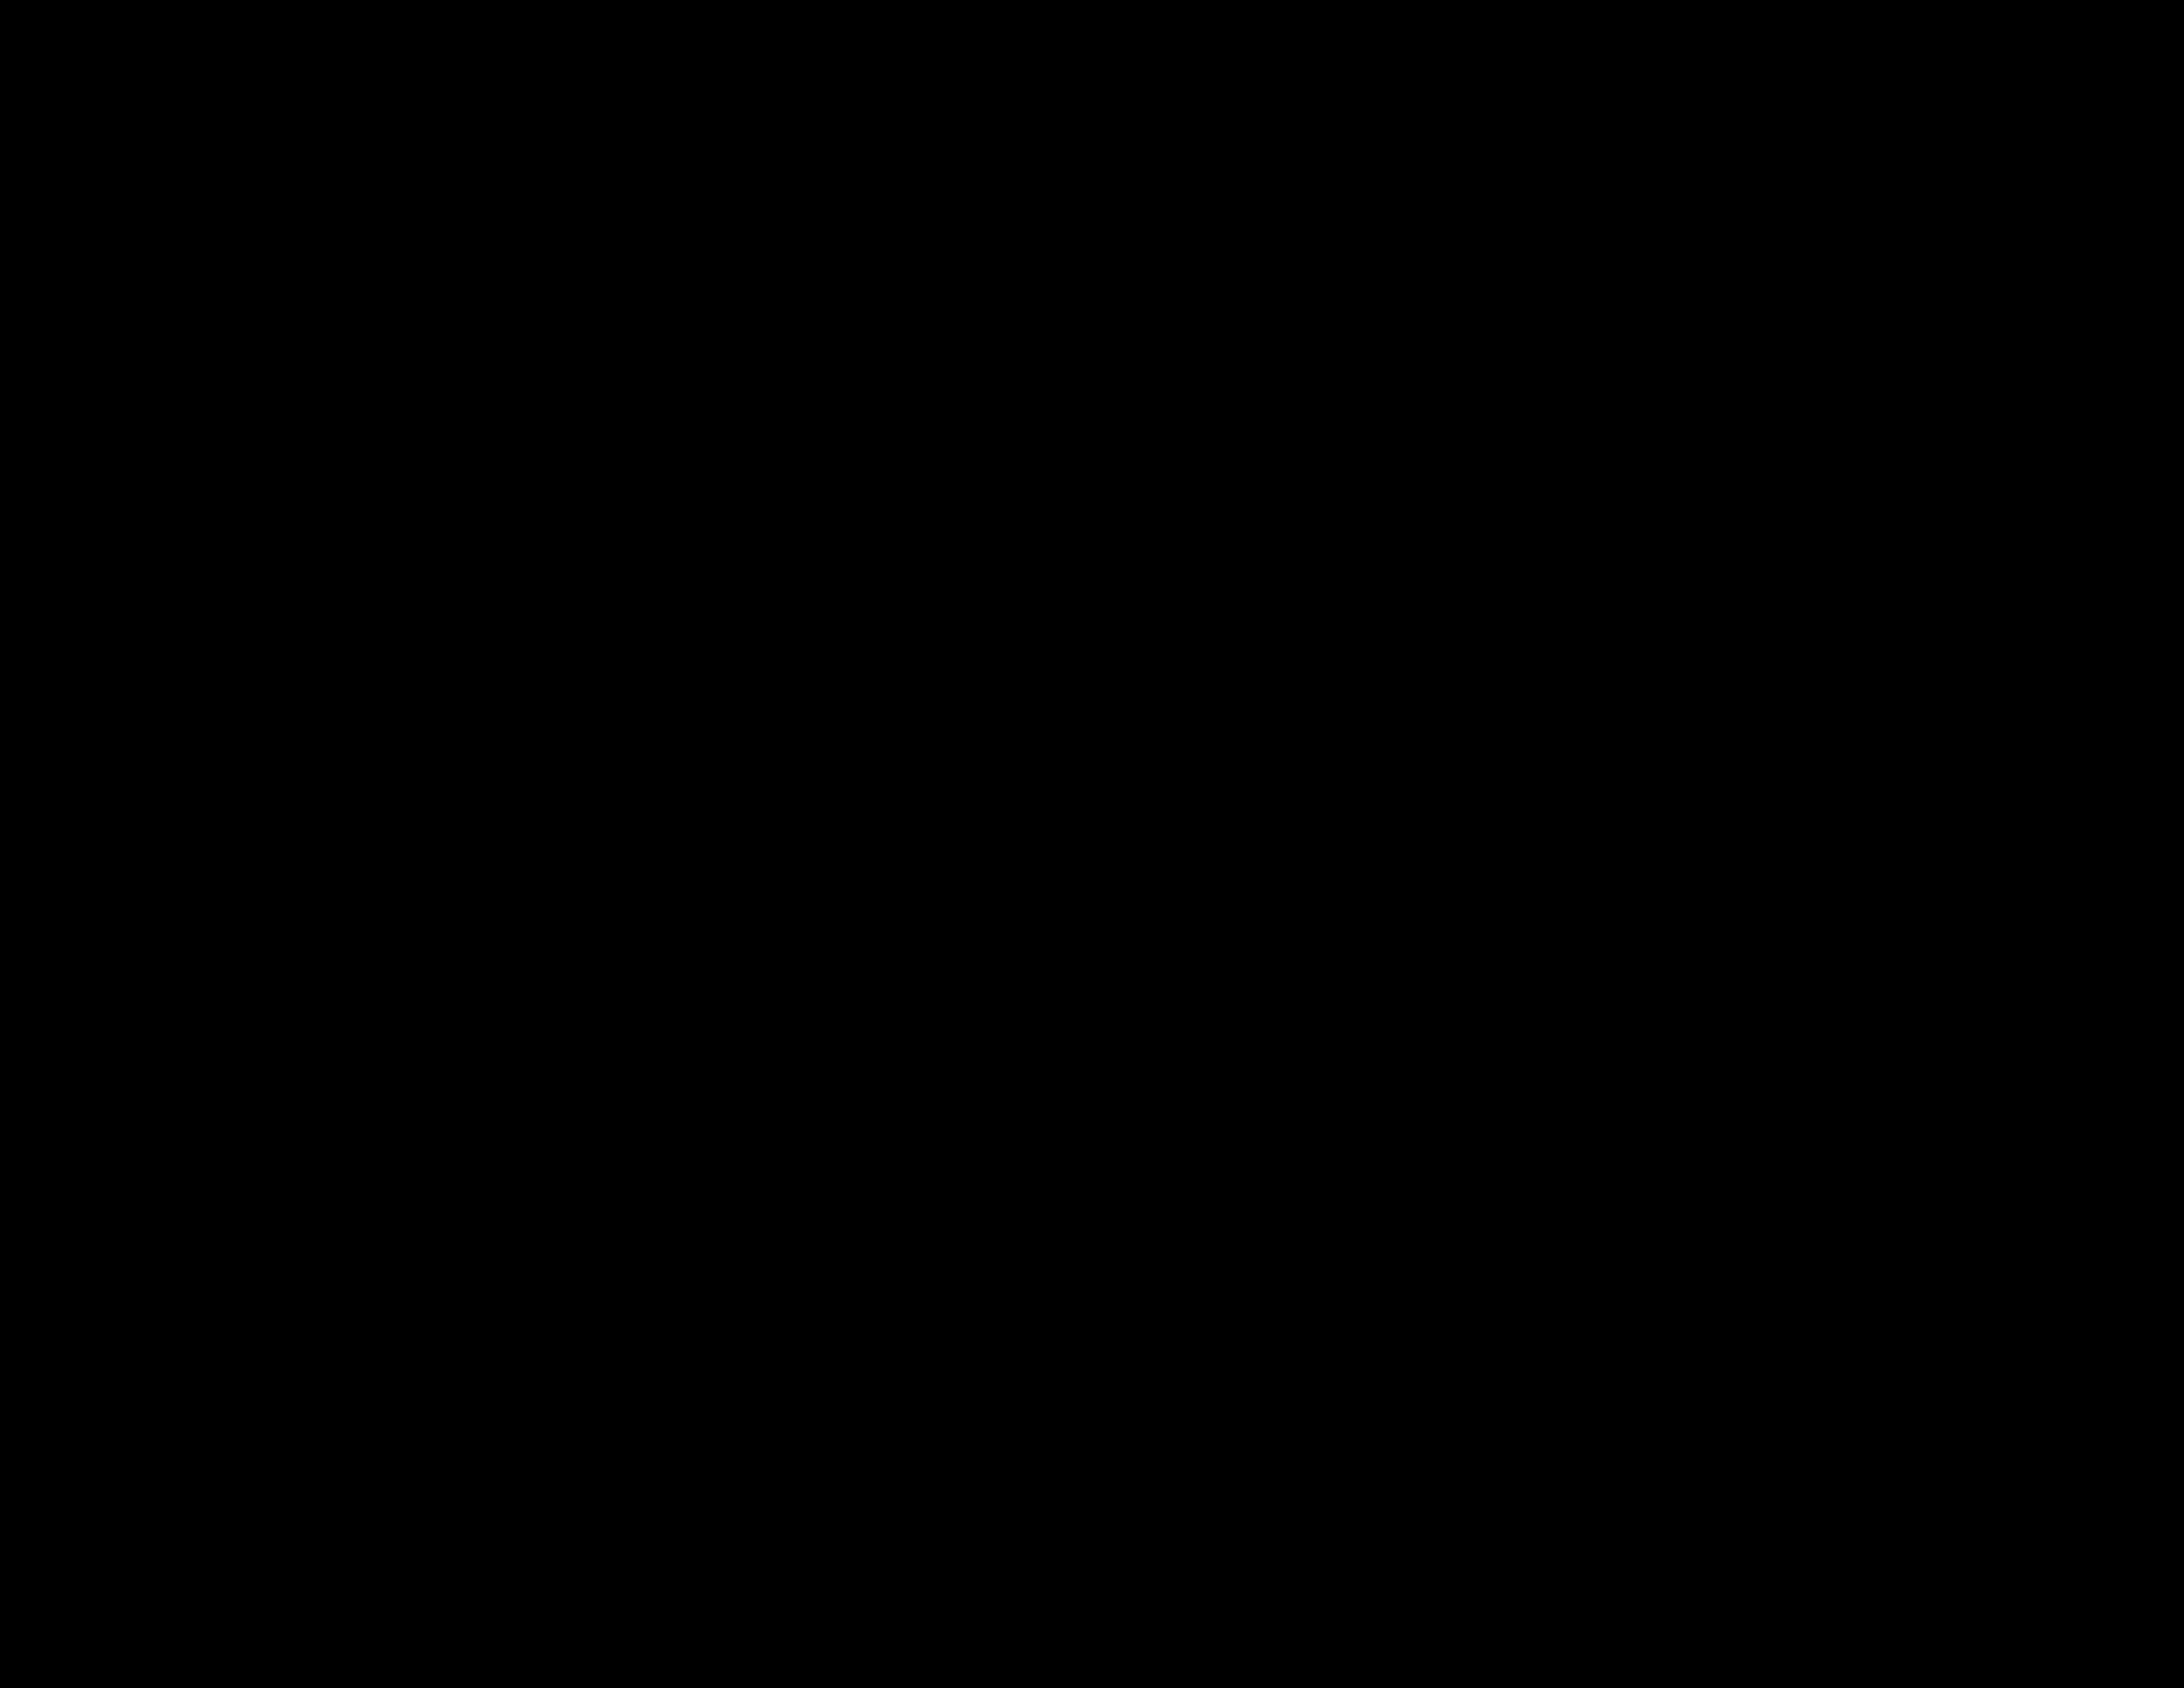 unesco-logo-10